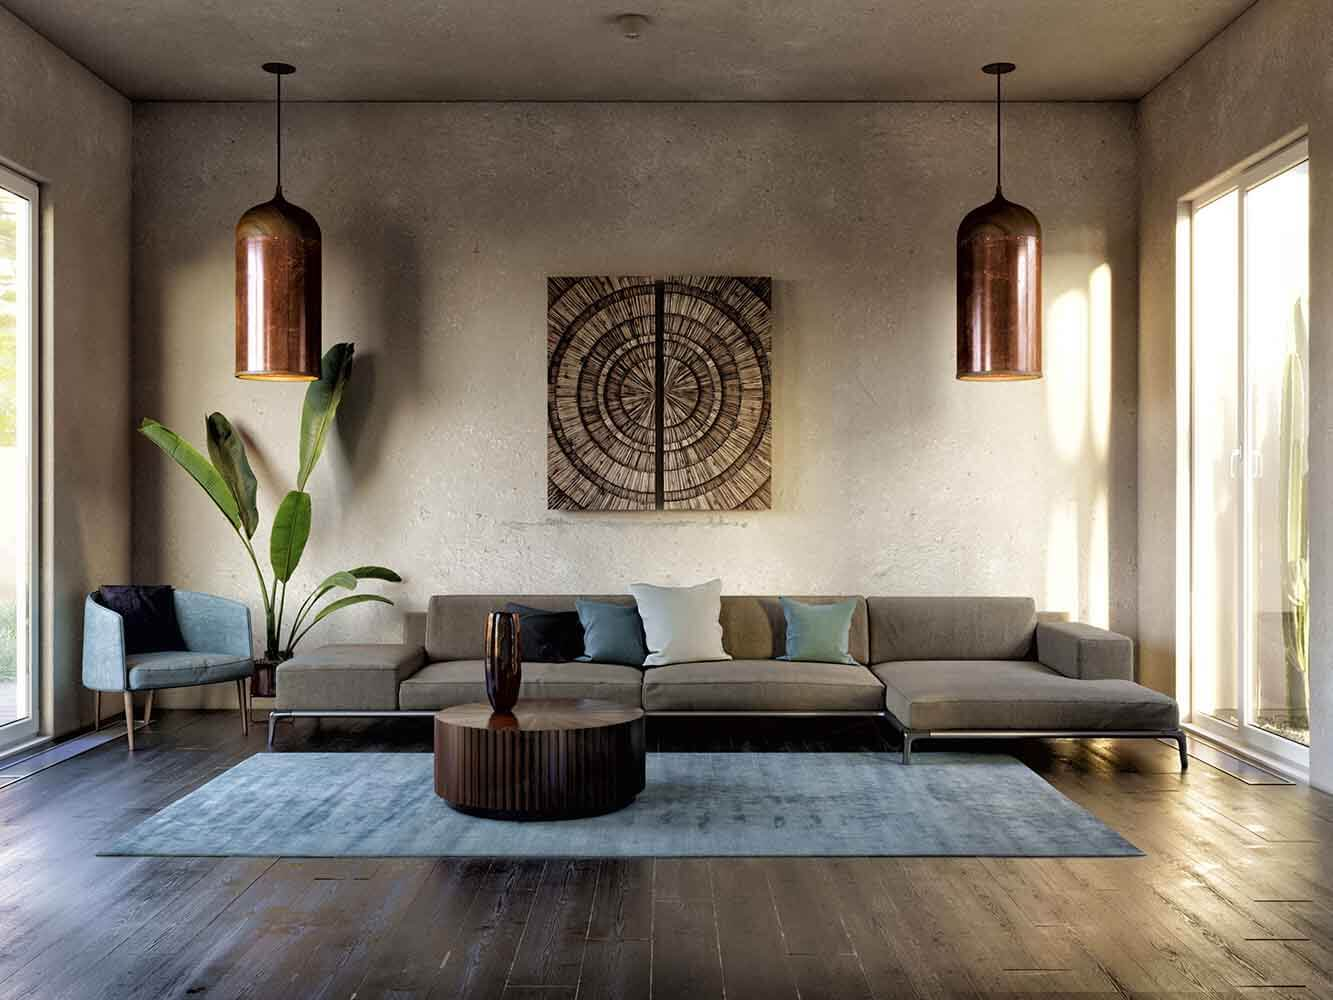 "design project vila v ispanii vabi sabi by archevista design 01 - Дизайн интерьера в стиле ваби-саби ""Вилла в Испании"" by ARCHEVISTA DESIGN"